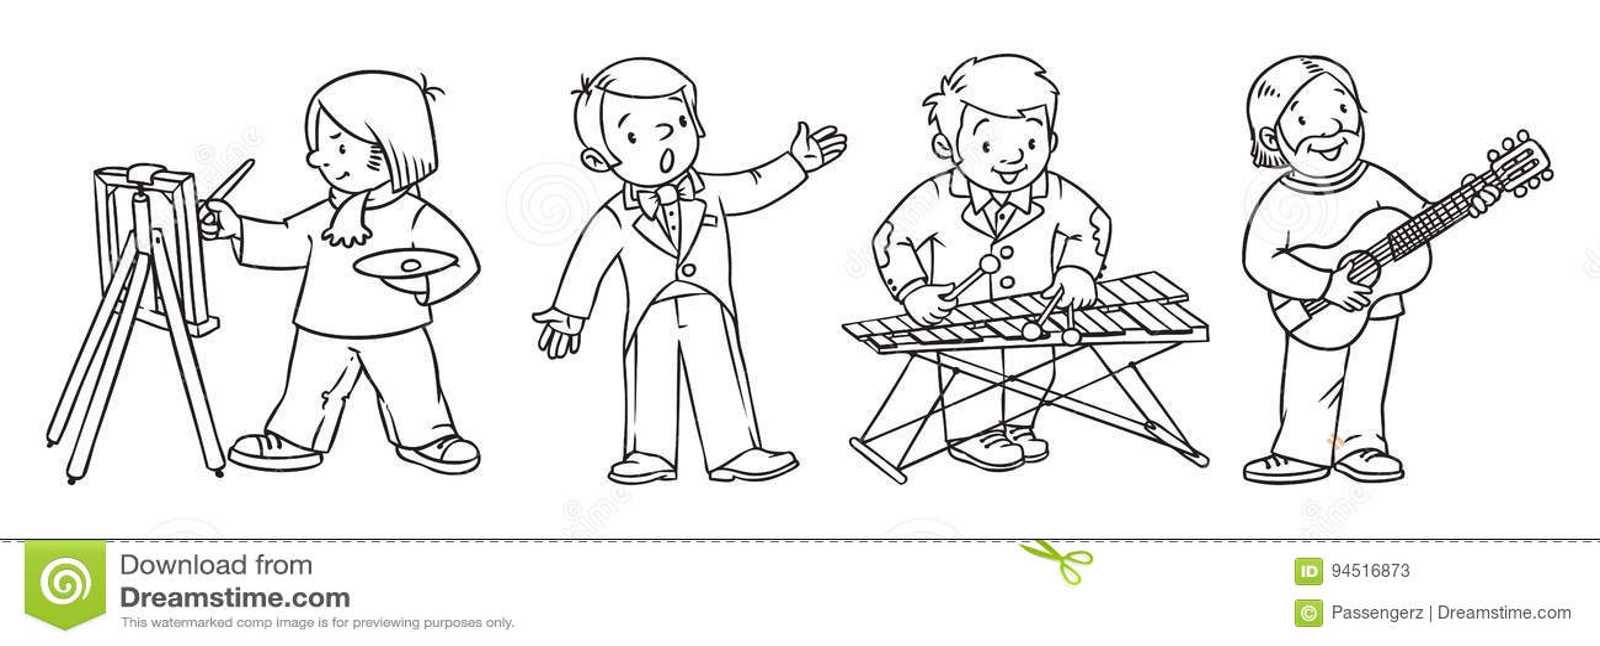 art professions coloring book  stock vector